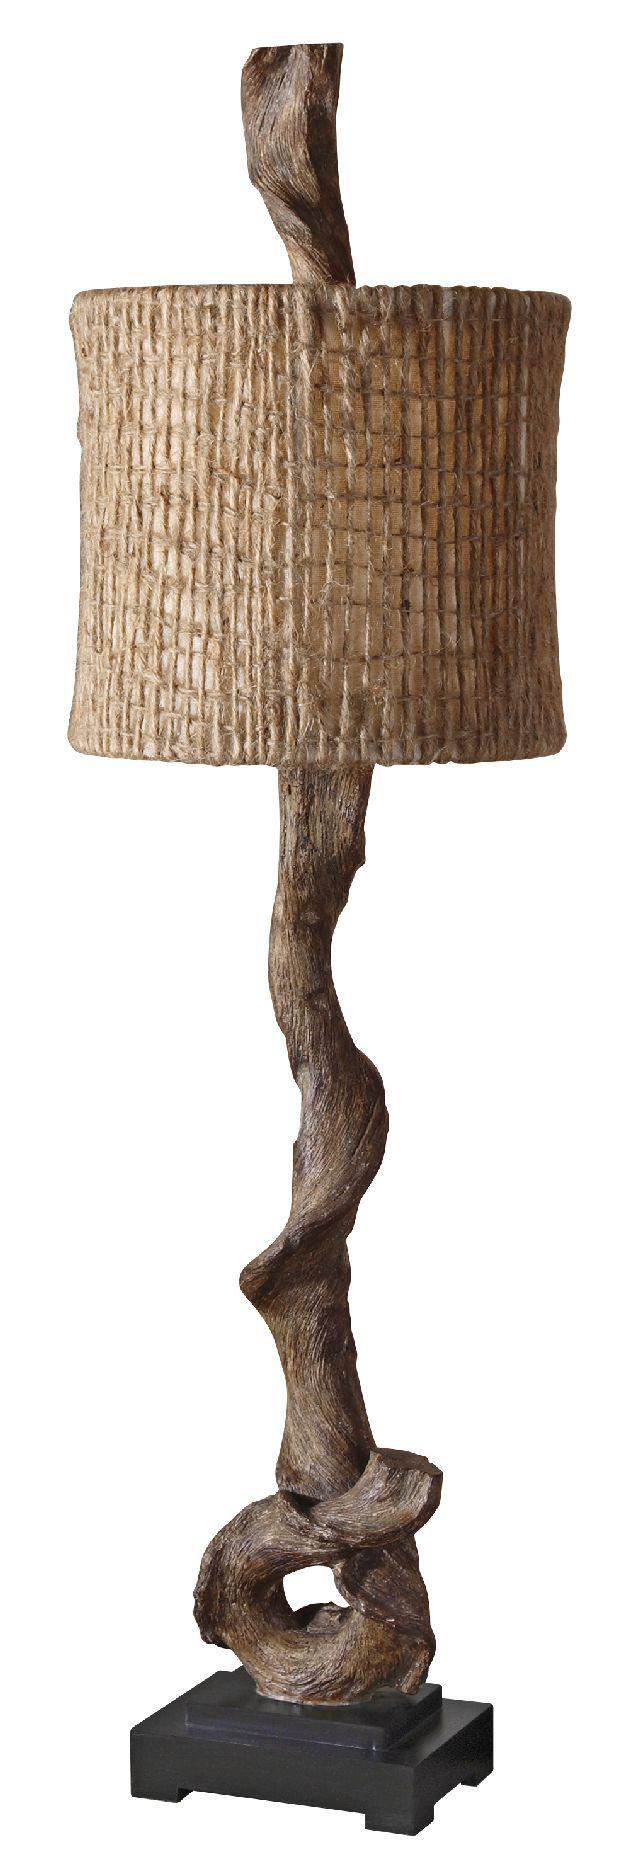 Driftwood lamp 11 diy s guide patterns - Driftwood Lamp Rustic Decorating Lamp